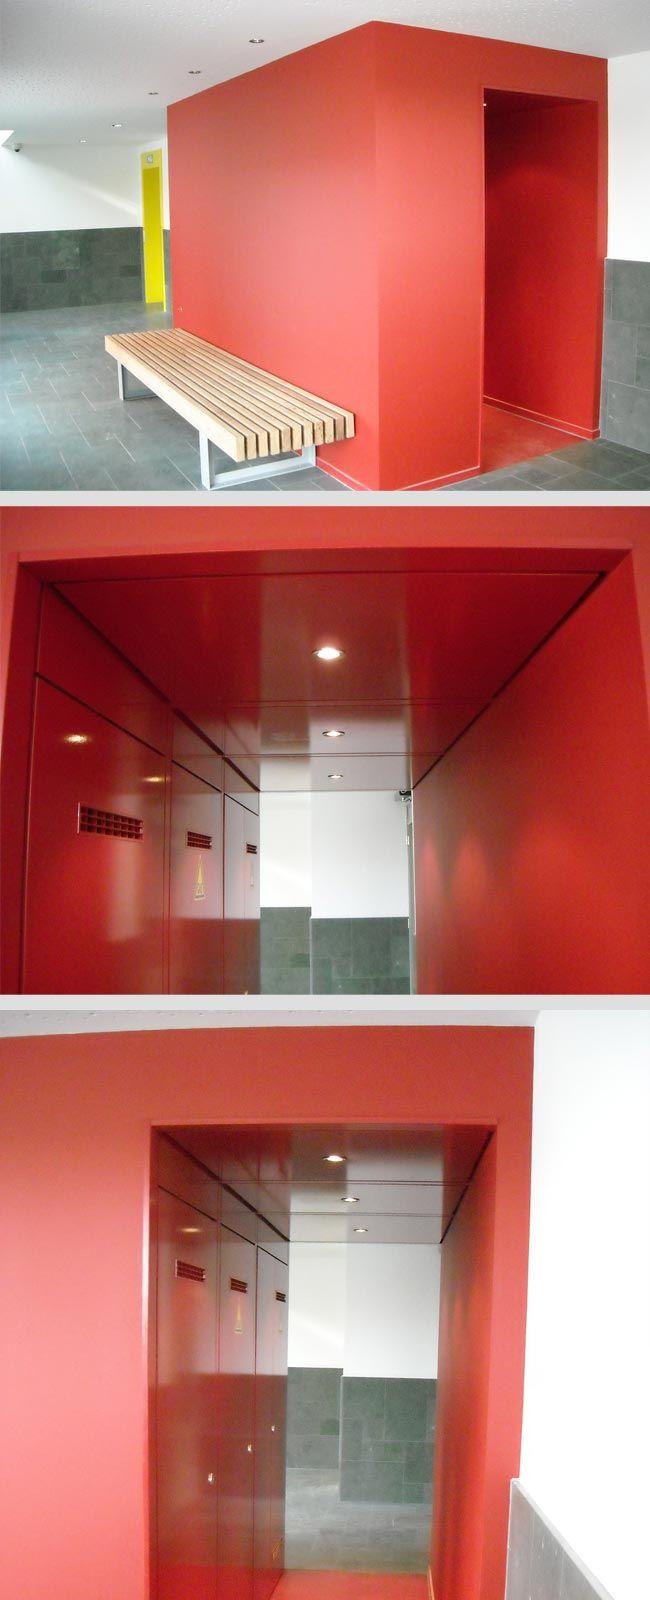 Mooi weggewerkte meterkasten | Rood gelakt MDF | Meer #wand #kast oplossingen: www.veteka.nl